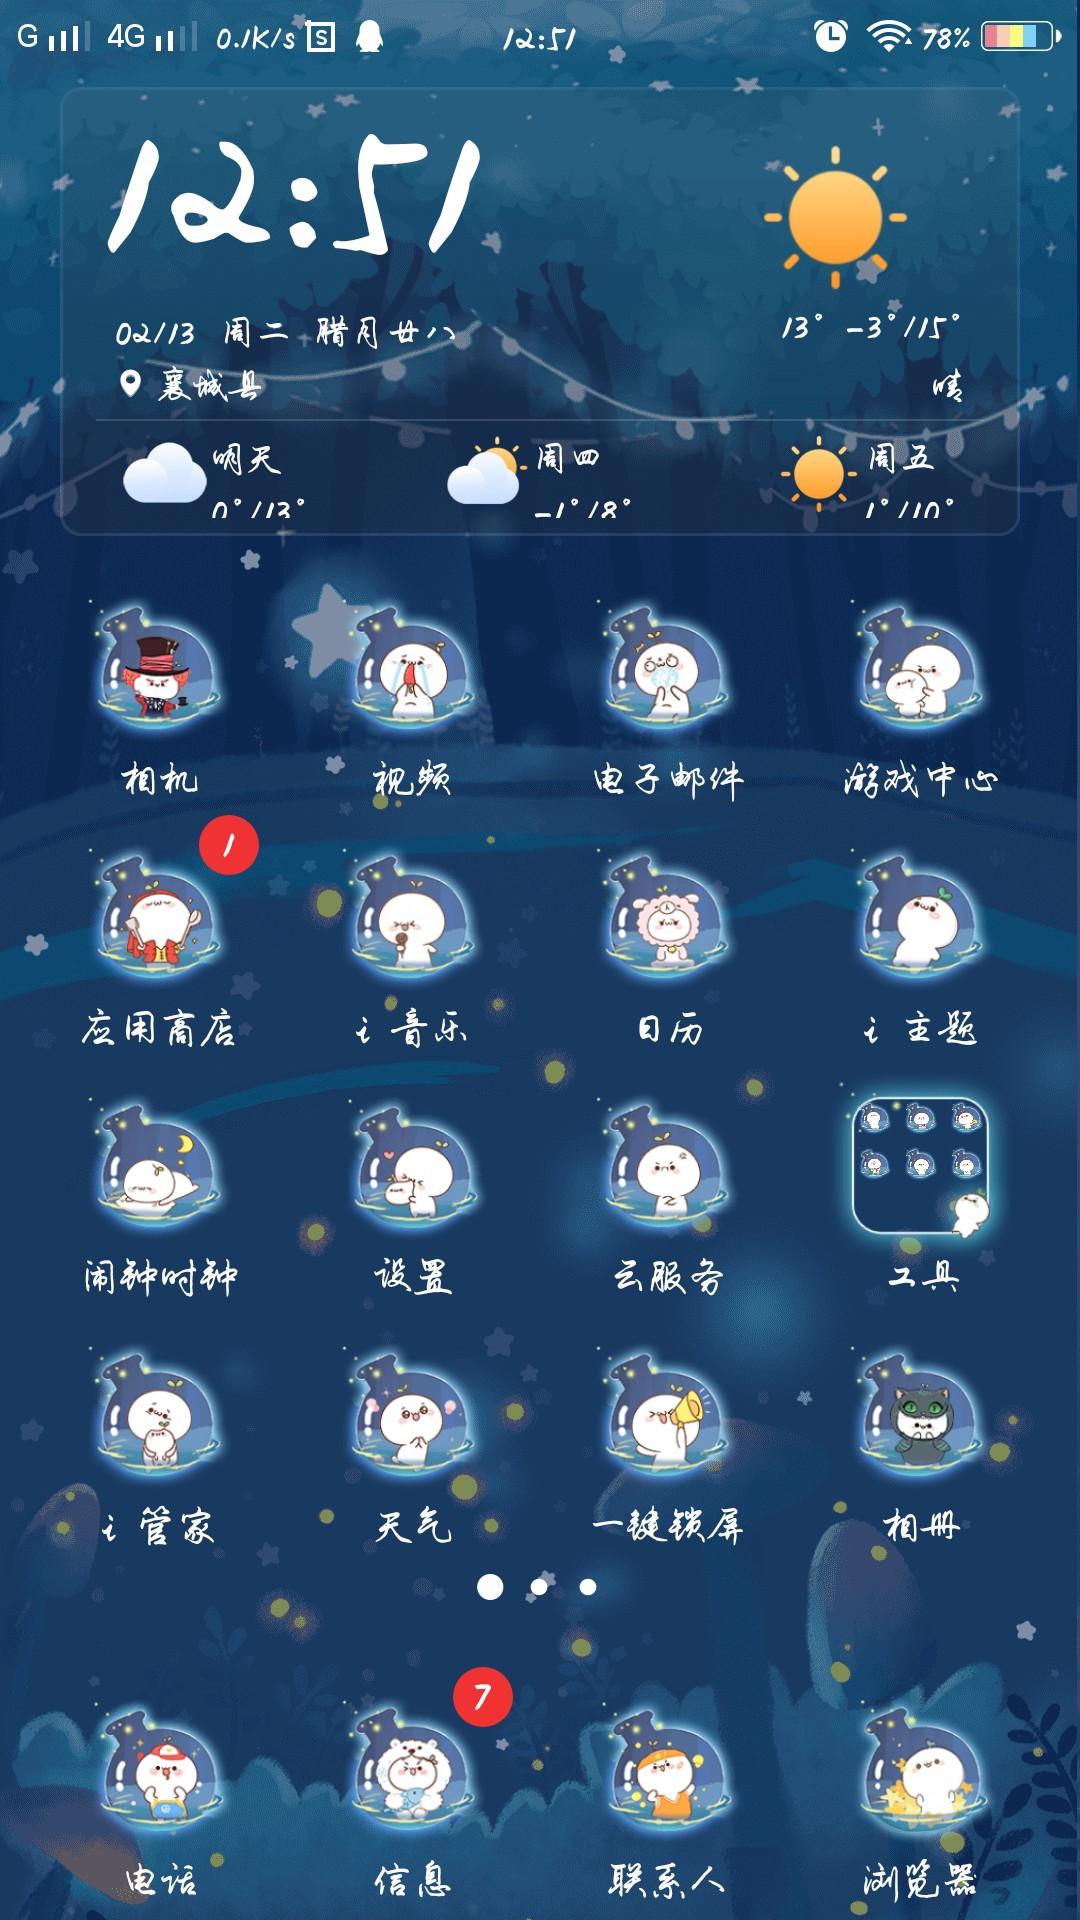 temp_????_20180213_125130.png